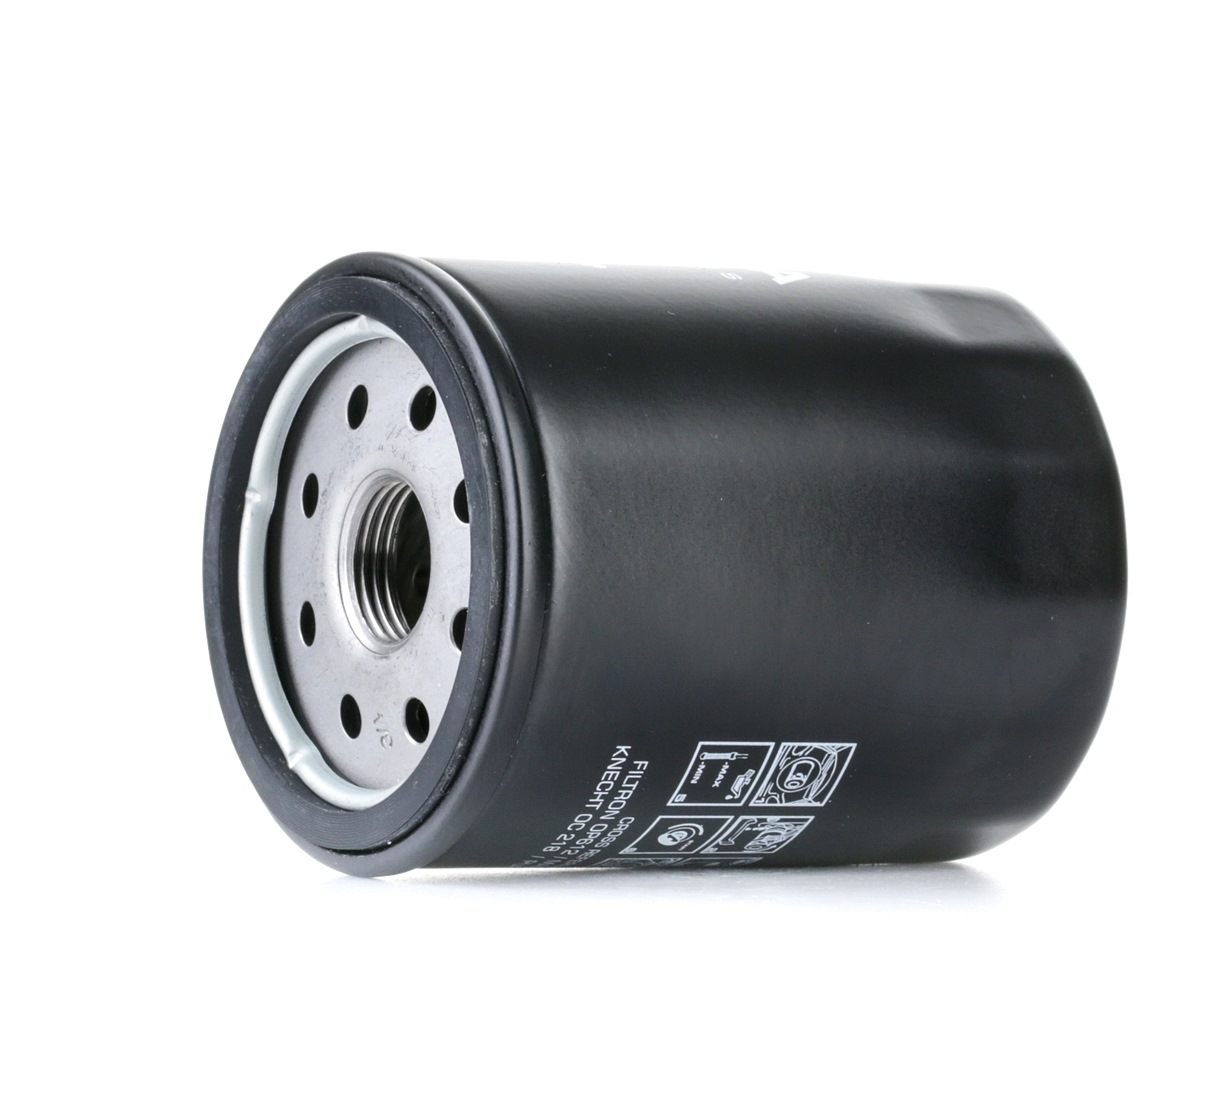 F103901 KAMOKA Anschraubfilter, mit einem Rücklaufsperrventil Ø: 65mm, Höhe: 87mm Ölfilter F103901 günstig kaufen